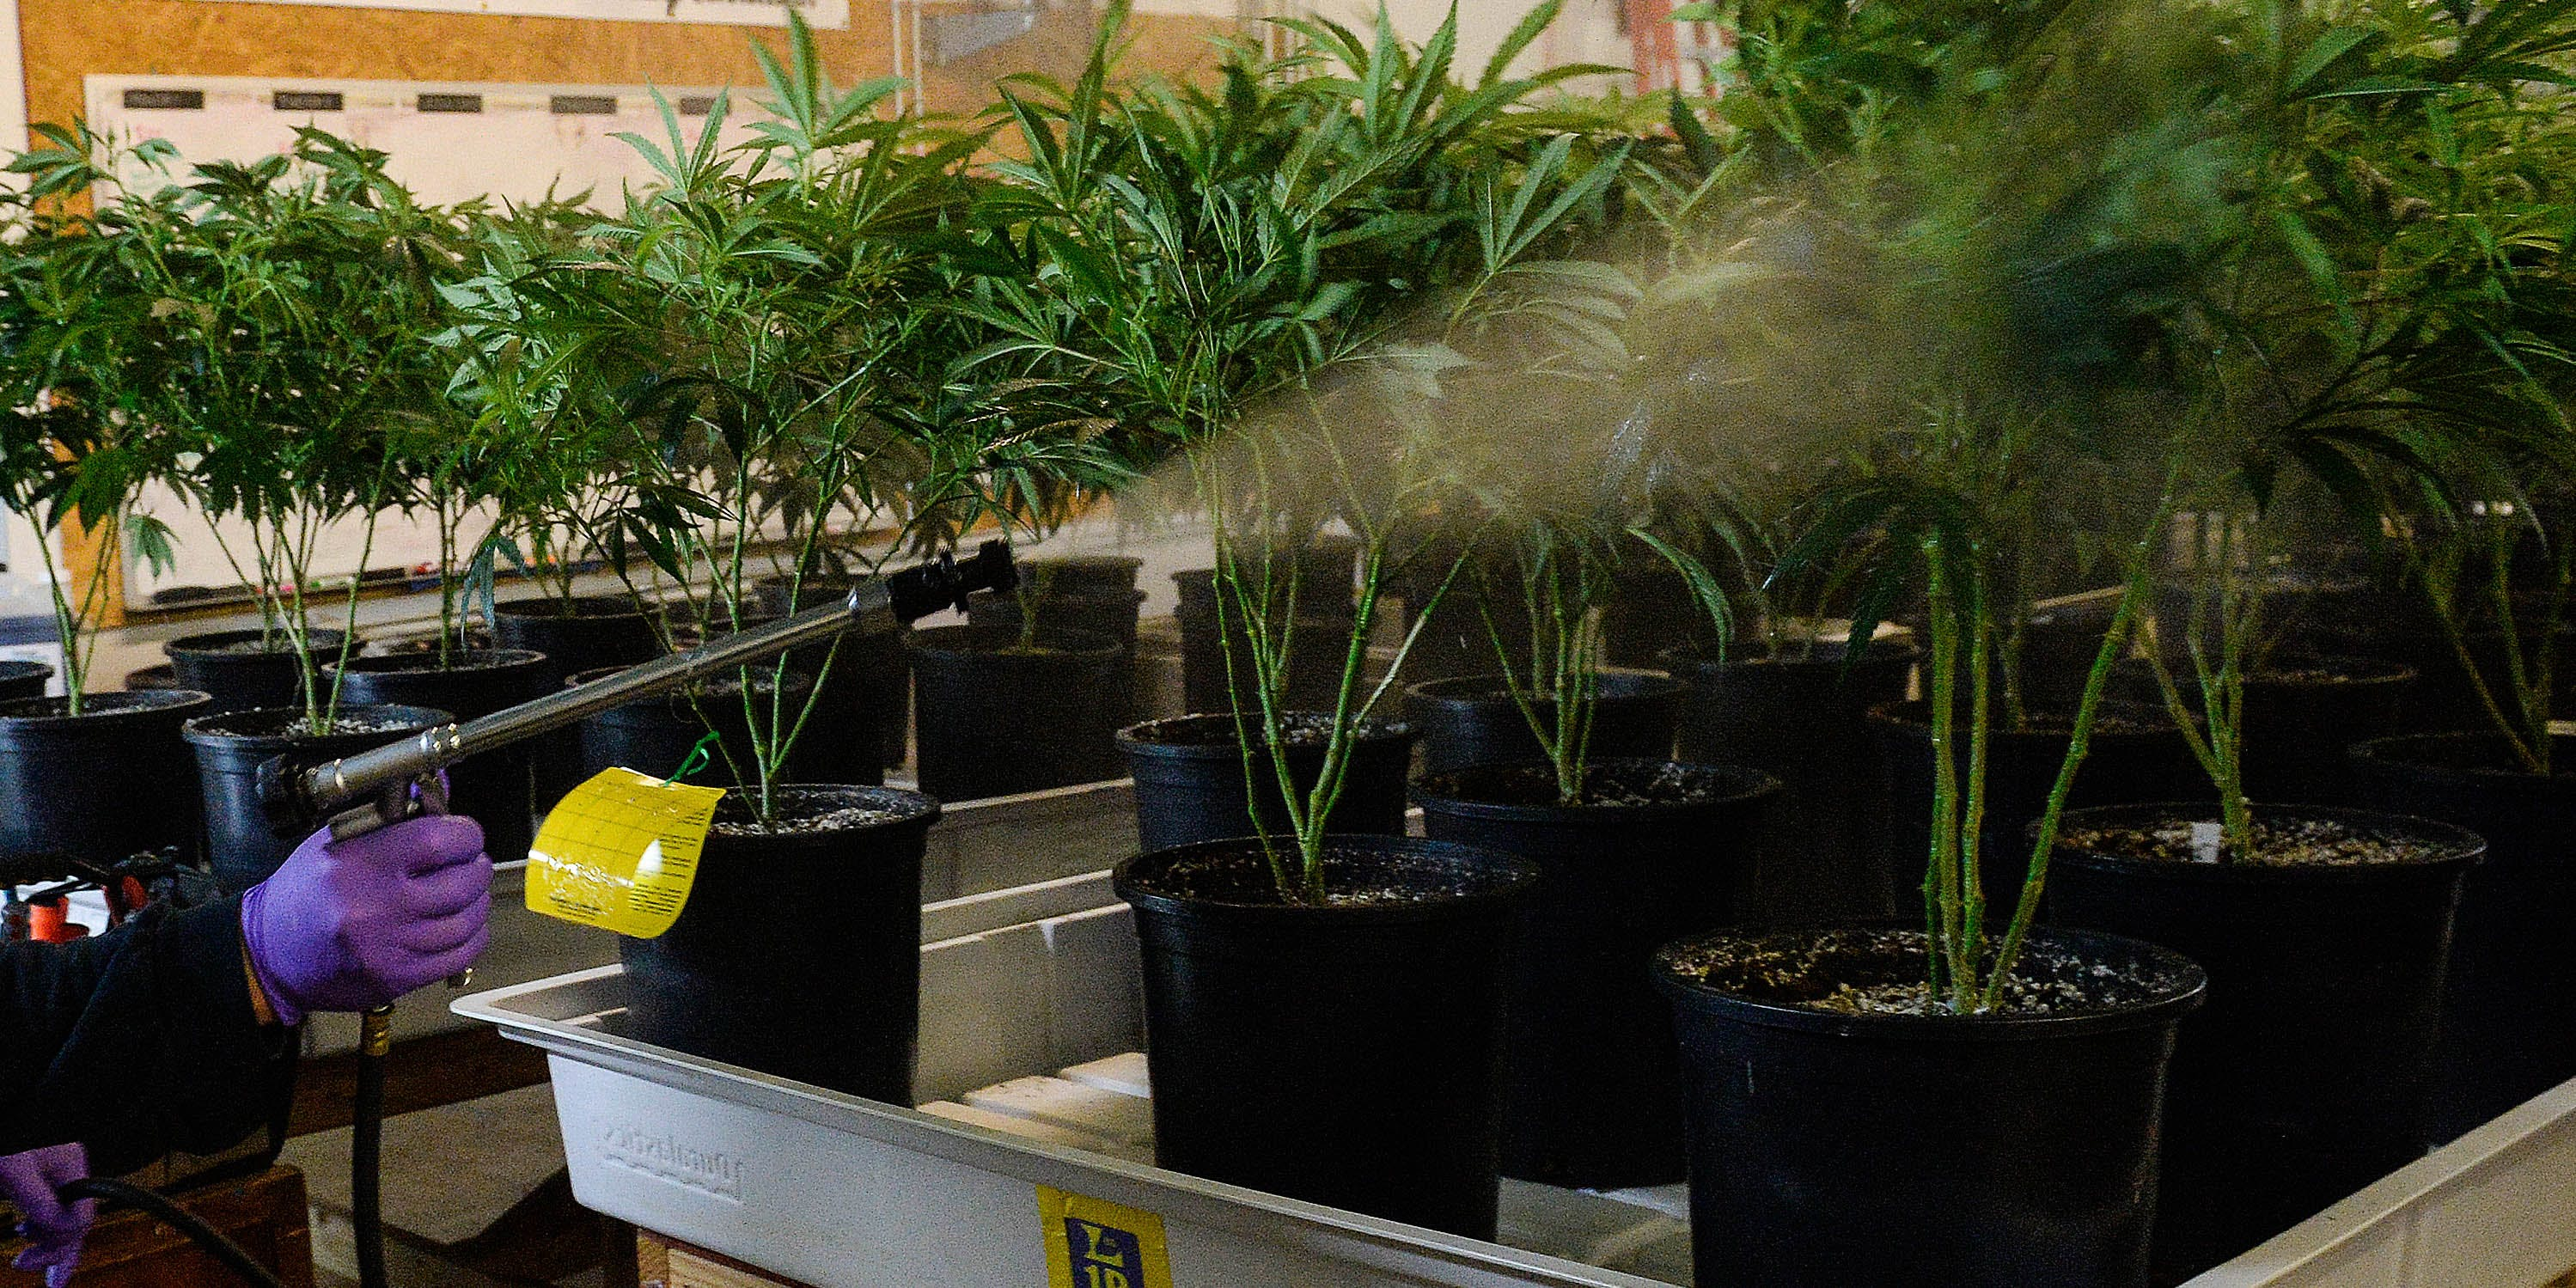 Toxic pesticide use rising at illegal California marijuana farms